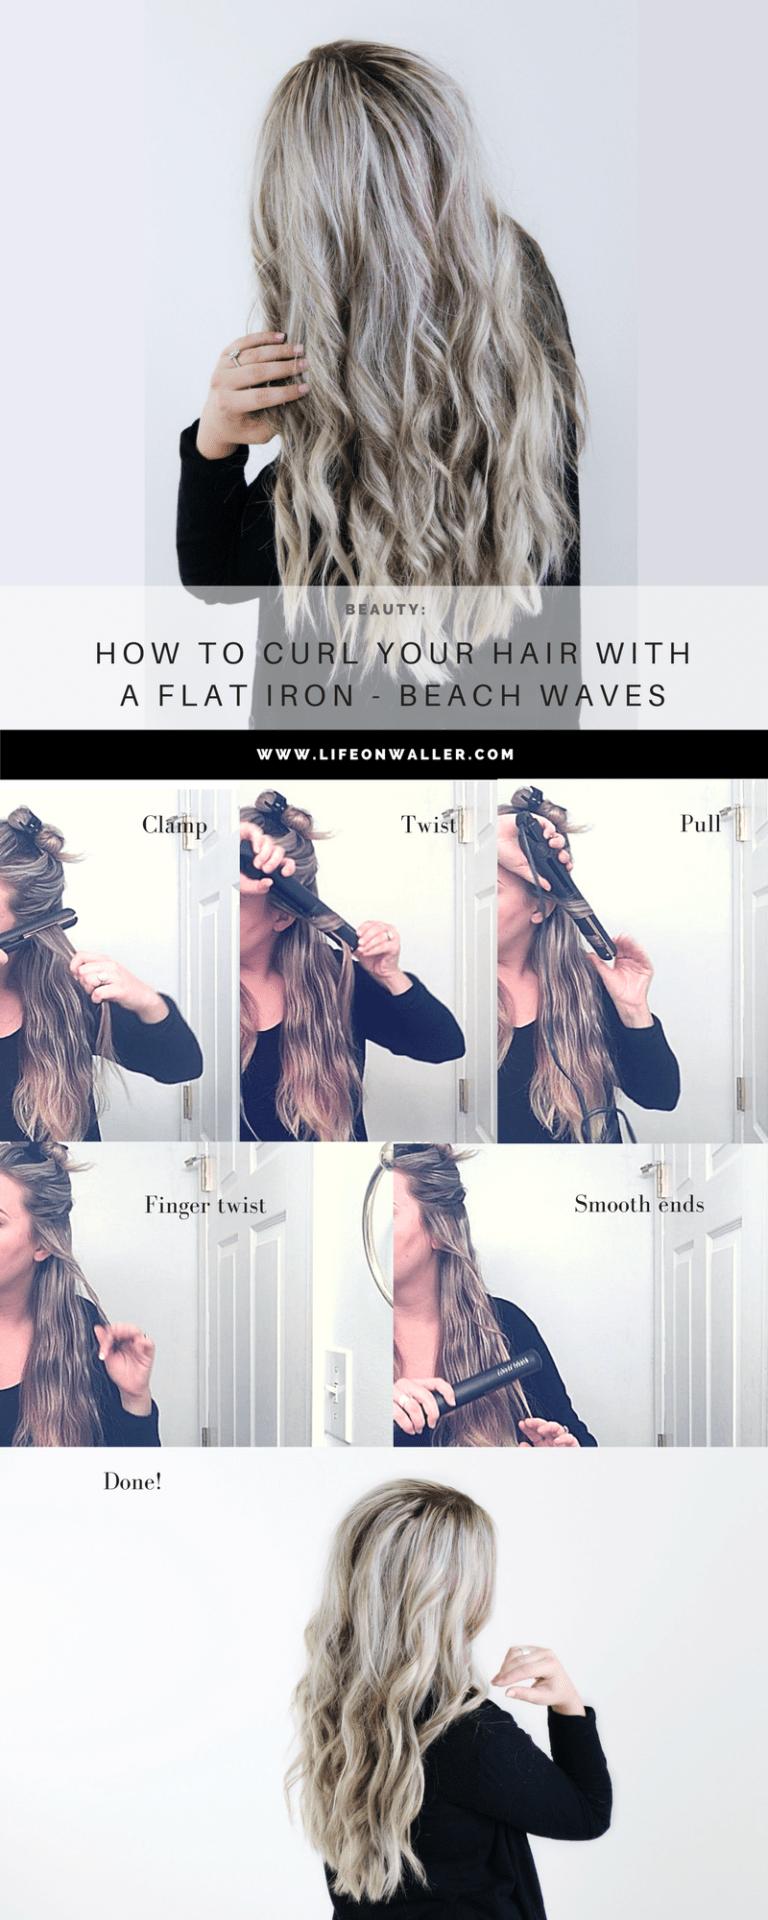 How To Curl Your Hair With A Flat Iron Beach Waves Cassie Scroggins Curls For Long Hair Flat Iron Hair Styles Waves Hair Tutorial